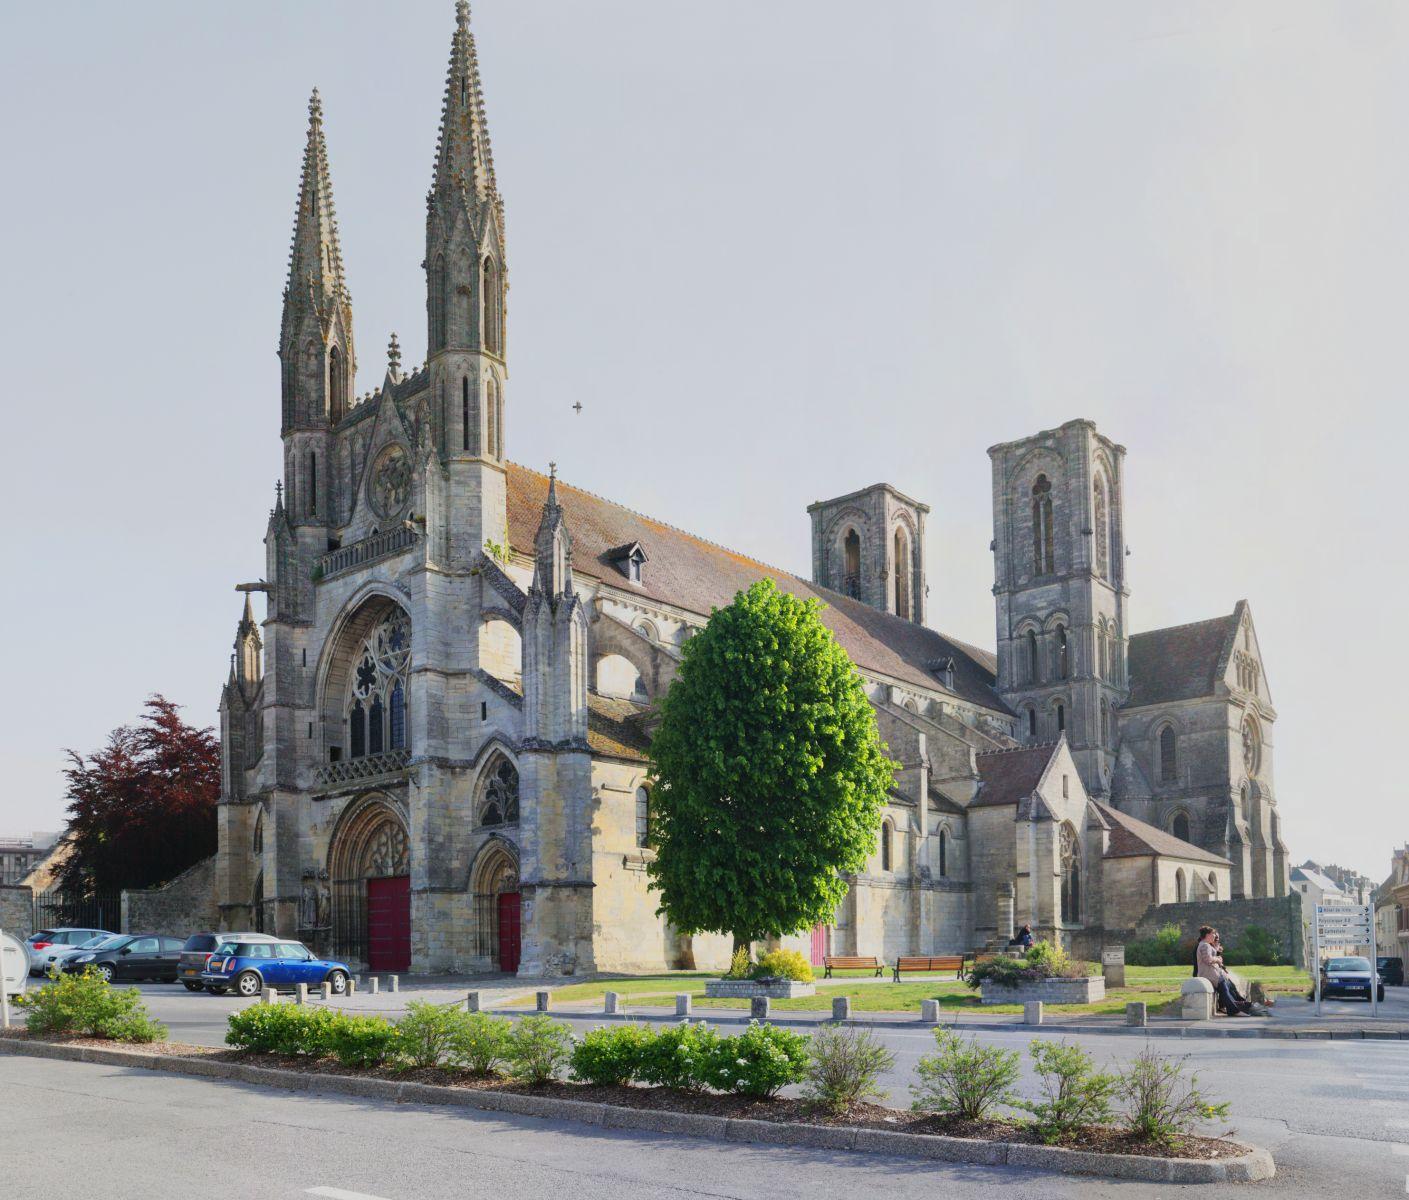 Laon France  city images : Church of St Martin, Laon, France, Landolia, a World of Photos